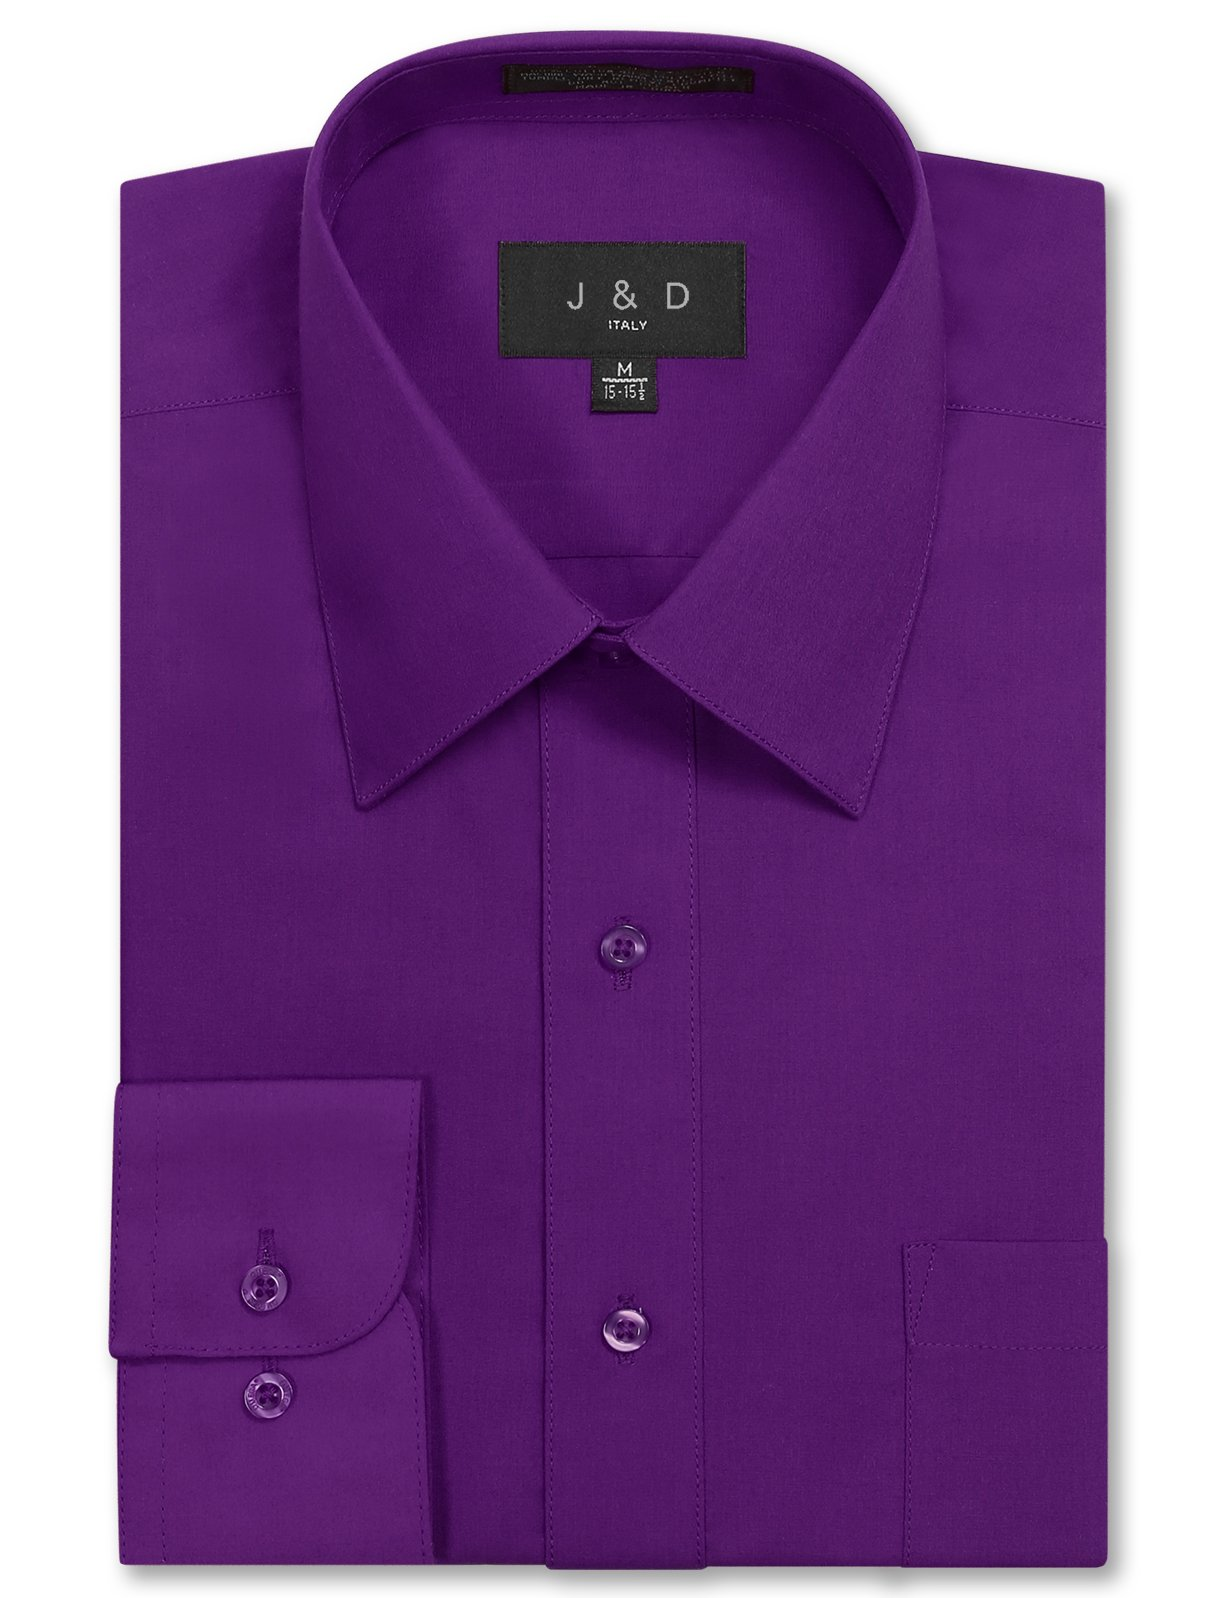 JD Apparel Mens Long Sleeve Regular Fit Solid Dress Shirt 17-17.5 N : 34-35 S Purple